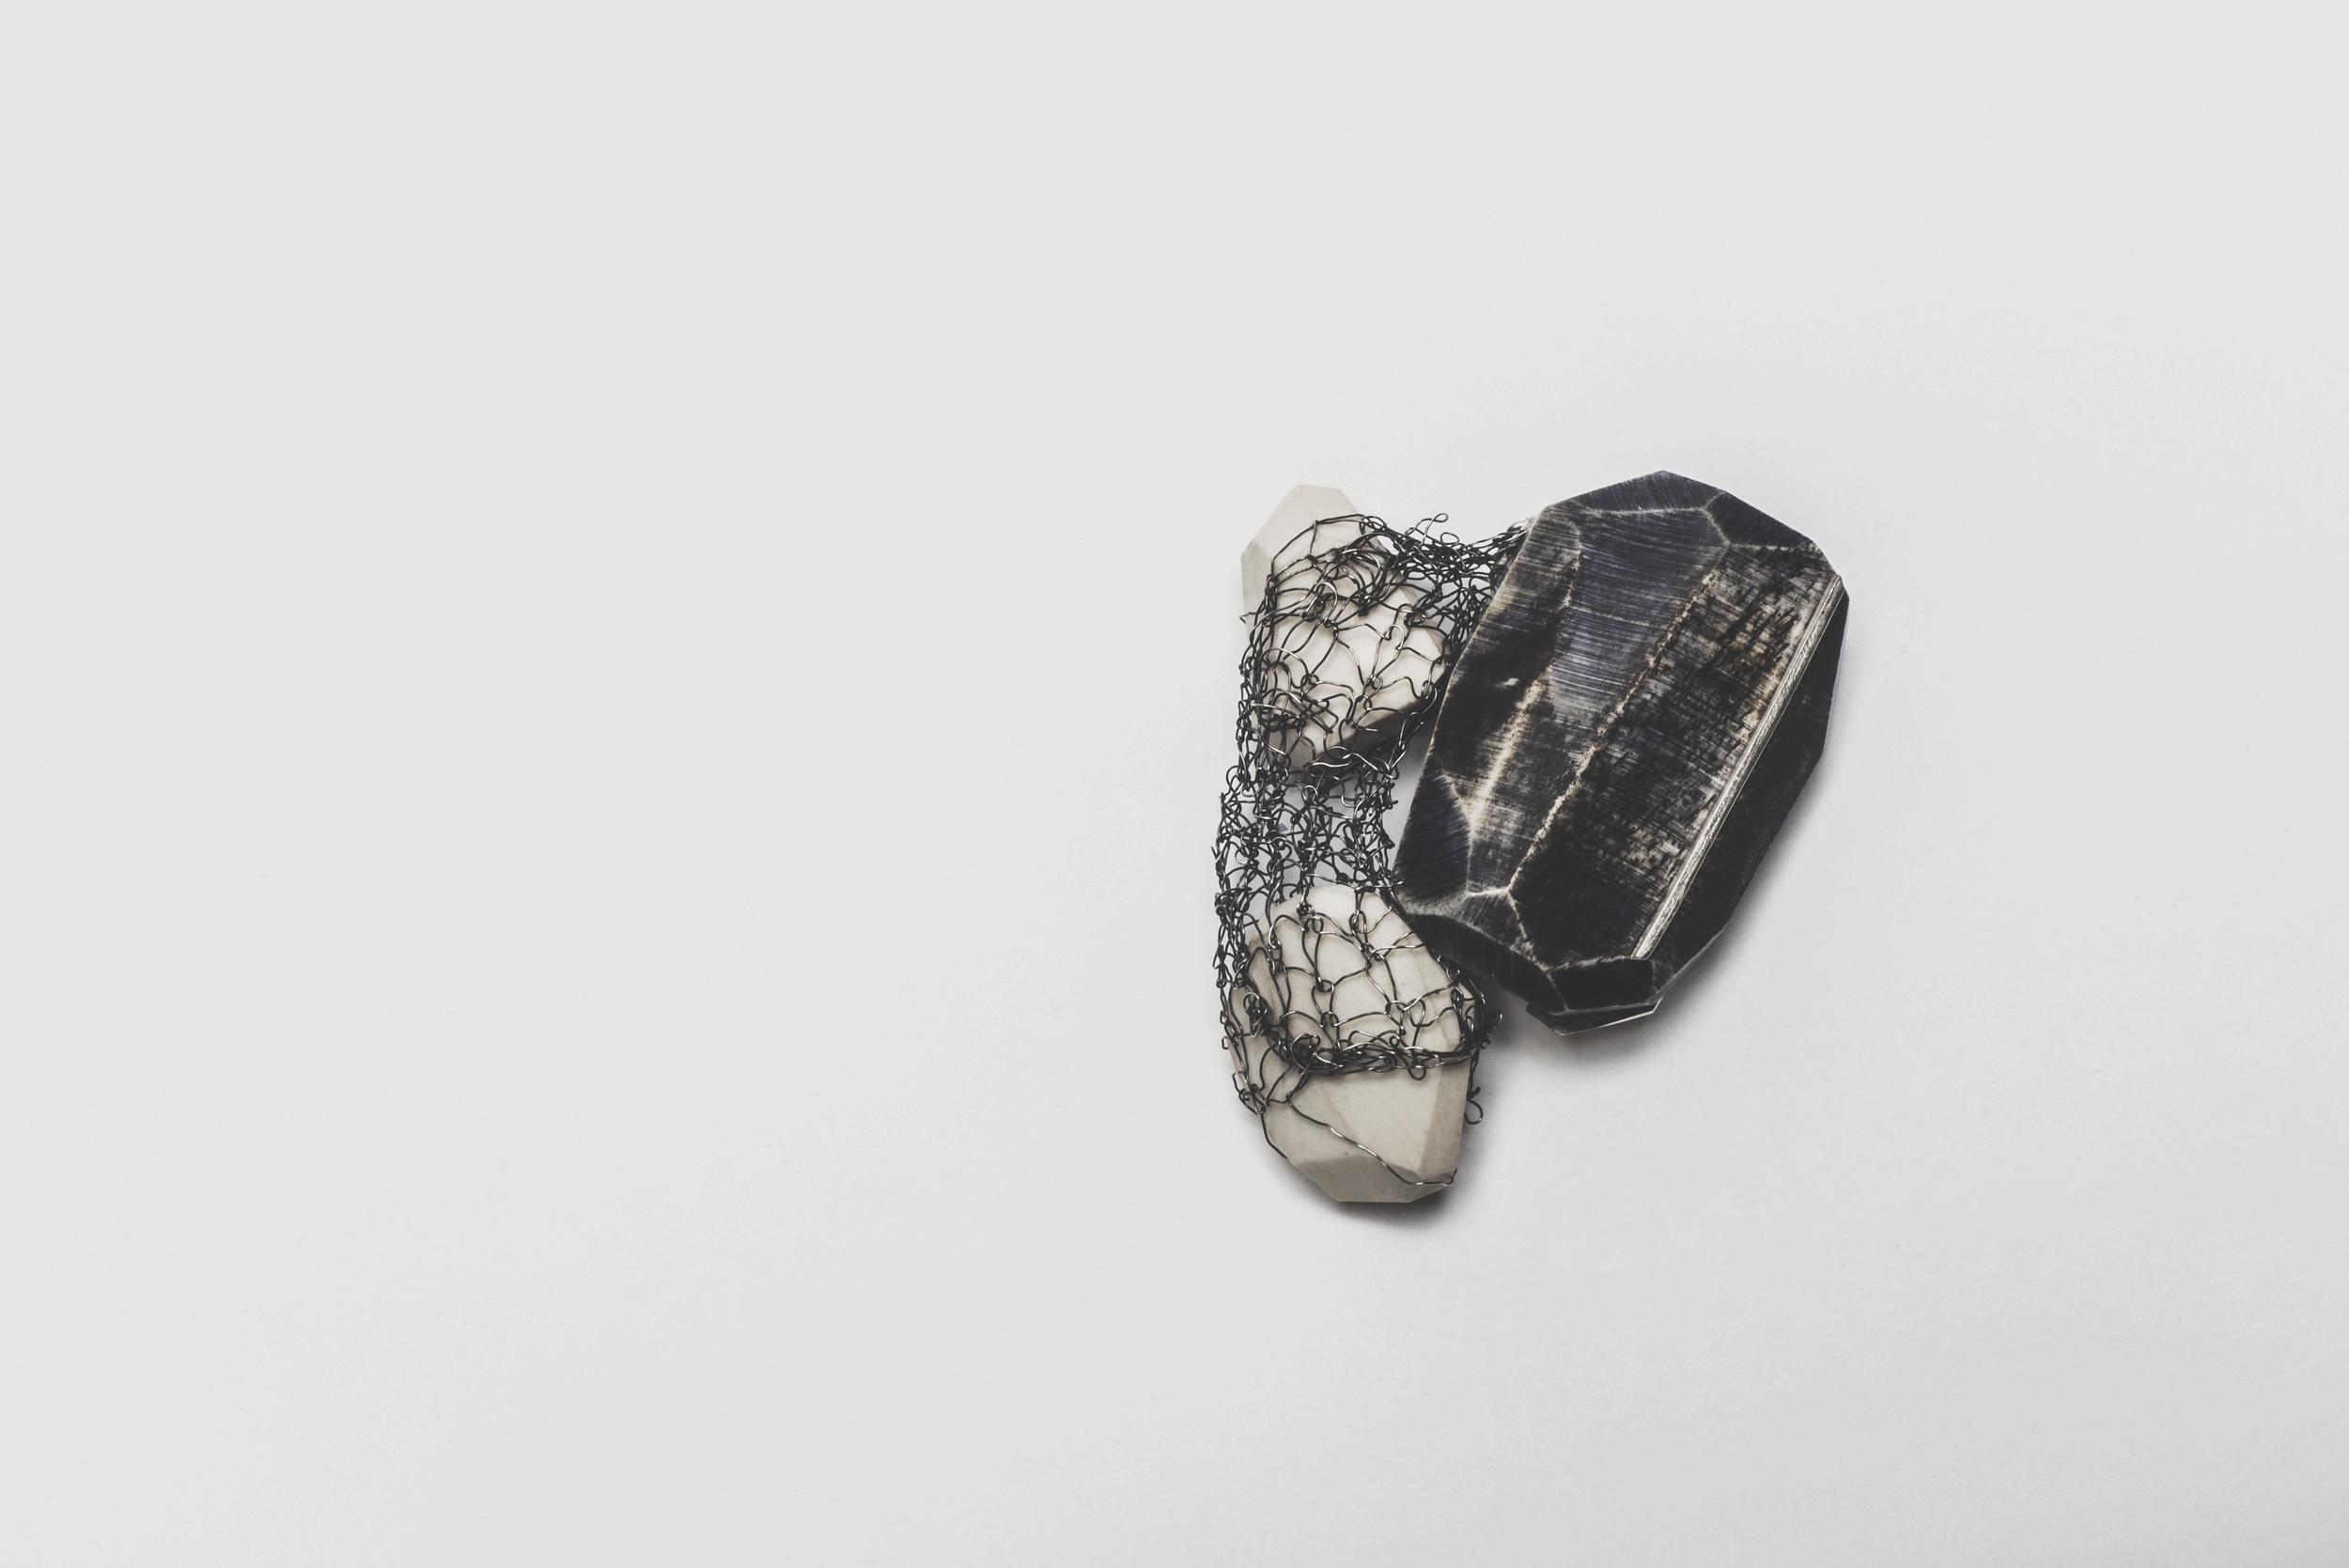 'Mir-cloiche' Brooch - Bone, Ink, Silver, Knitted Silver Wire